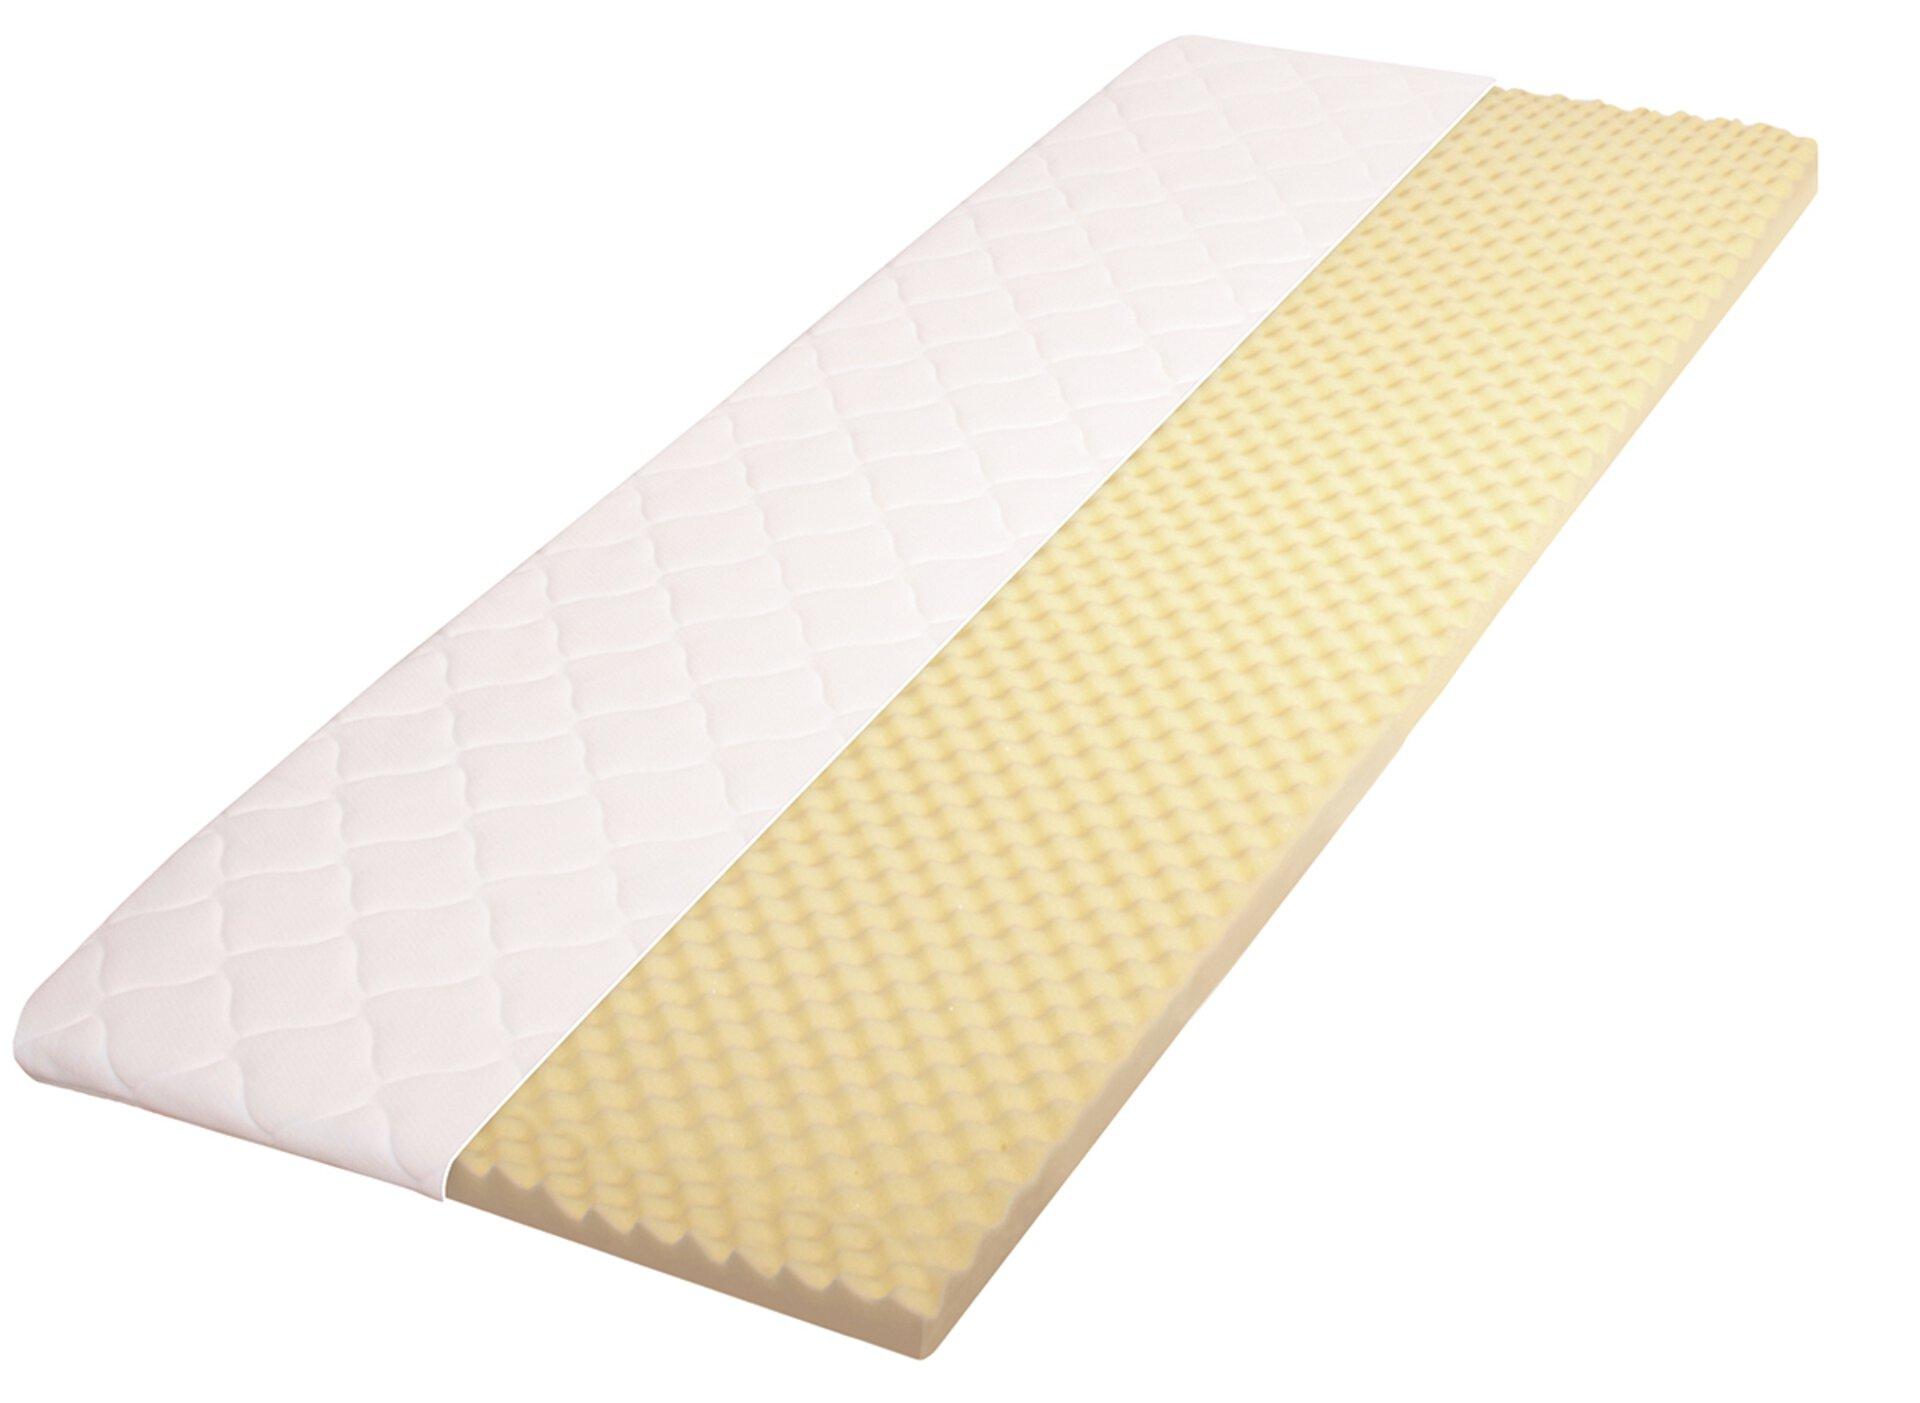 Topper MEMO VITA V250 Sun Garden Textil 200 x 6 x 140 cm